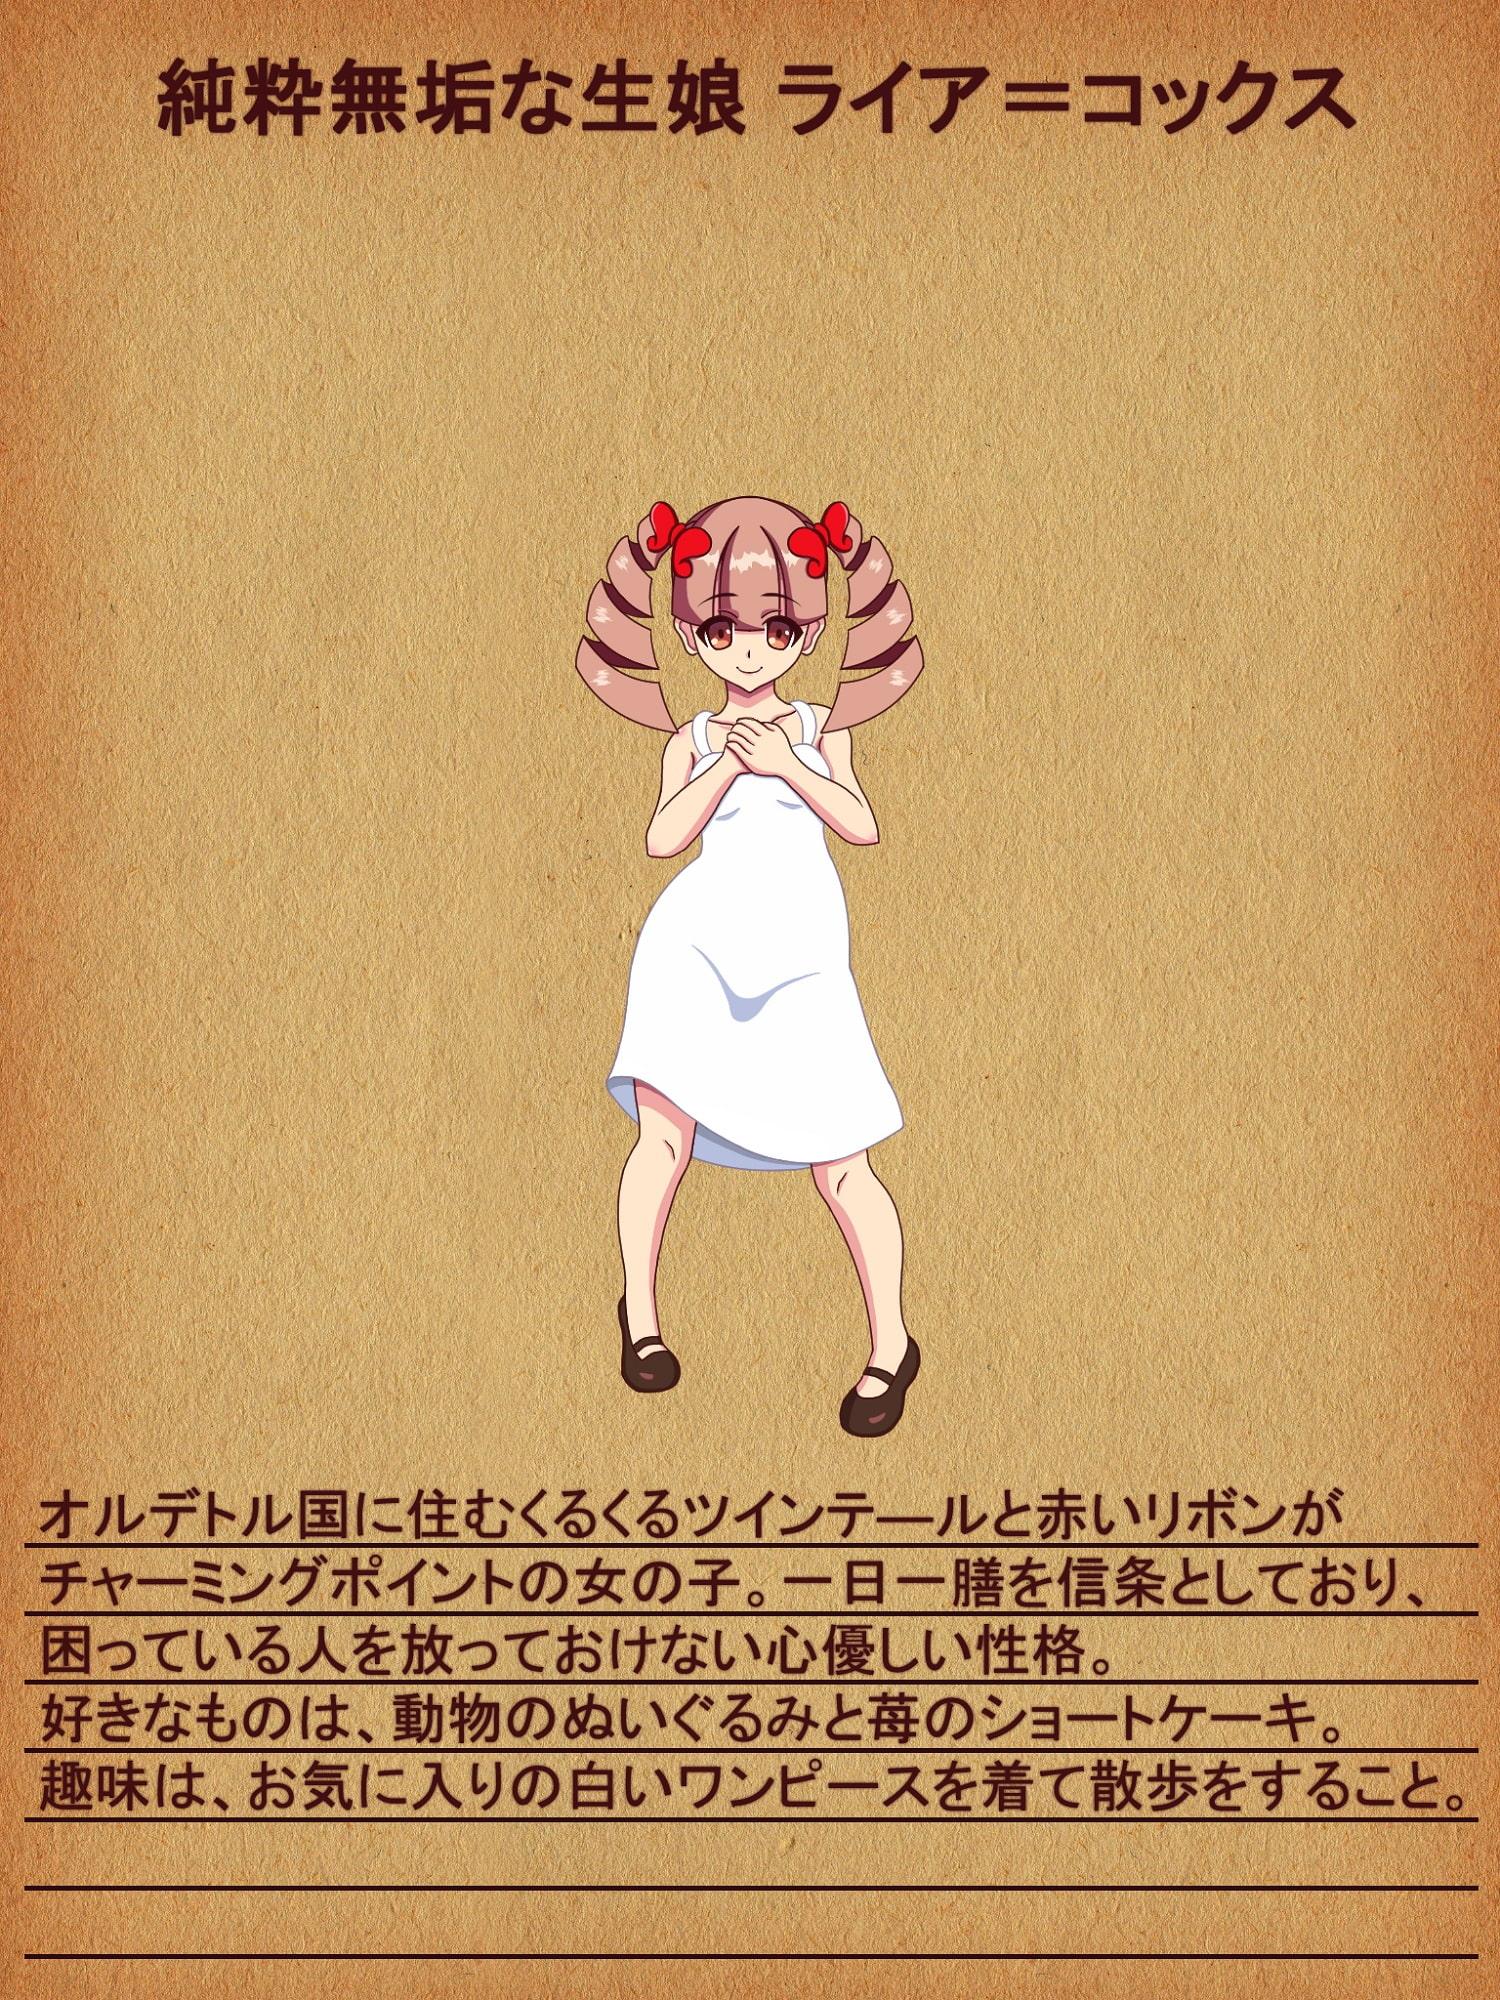 RJ324043 失堕ノ姫騎士IRIS 第二章 淫慾の沈溺者 [20210911]